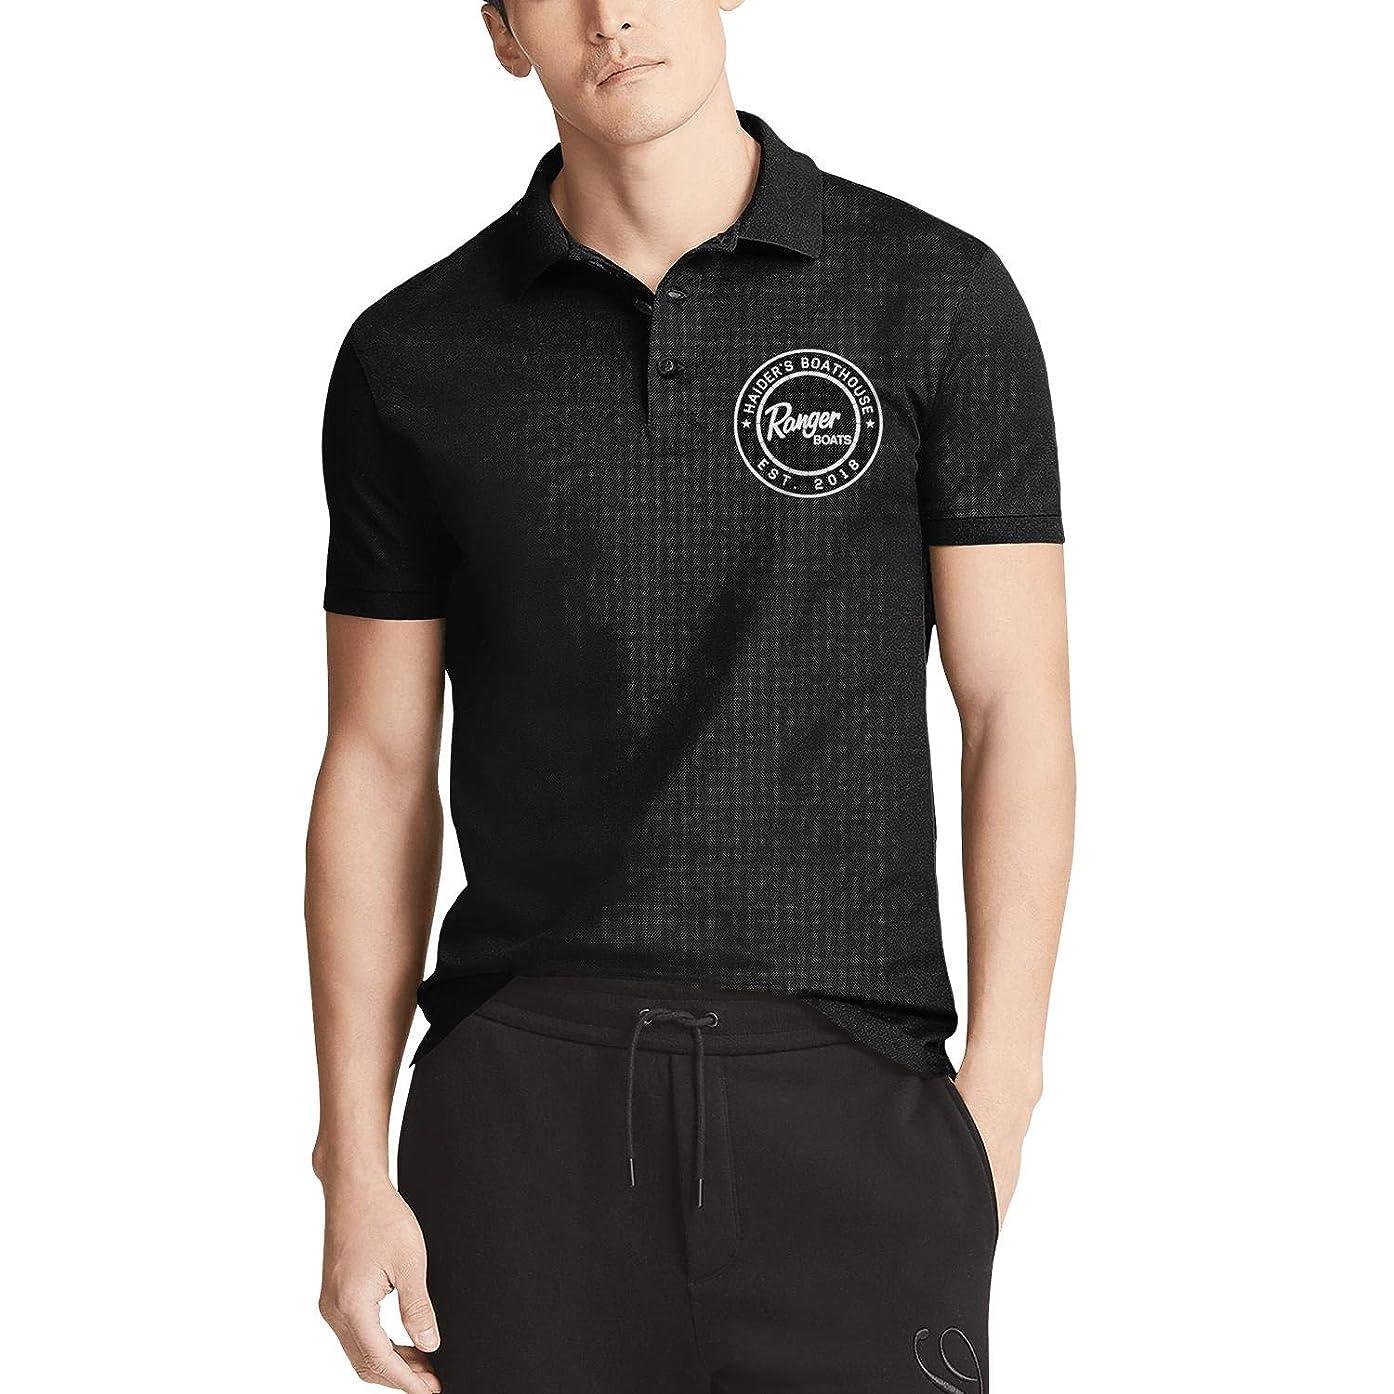 linchen Mens Ranger Boats Polo T Shirt Button Cotton T Shirt Printing Tee T Shirts Casual Tee,t-Shirt